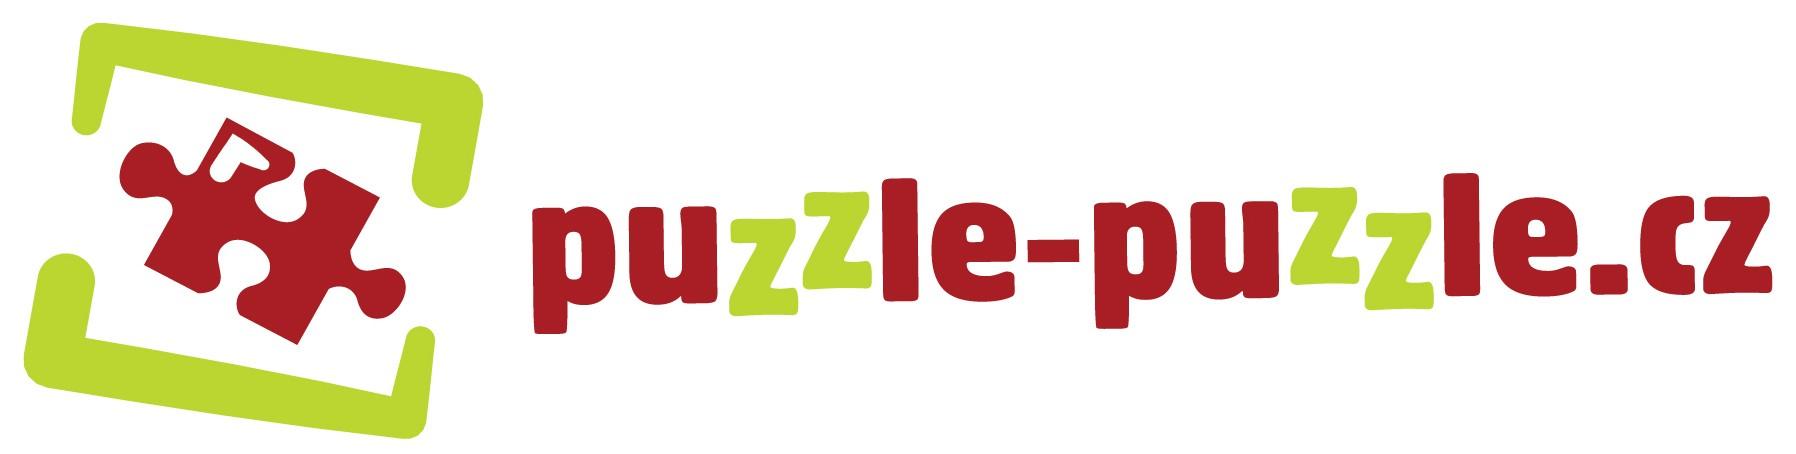 Image result for puzzle puzzle bystřice pod hostýnem logo